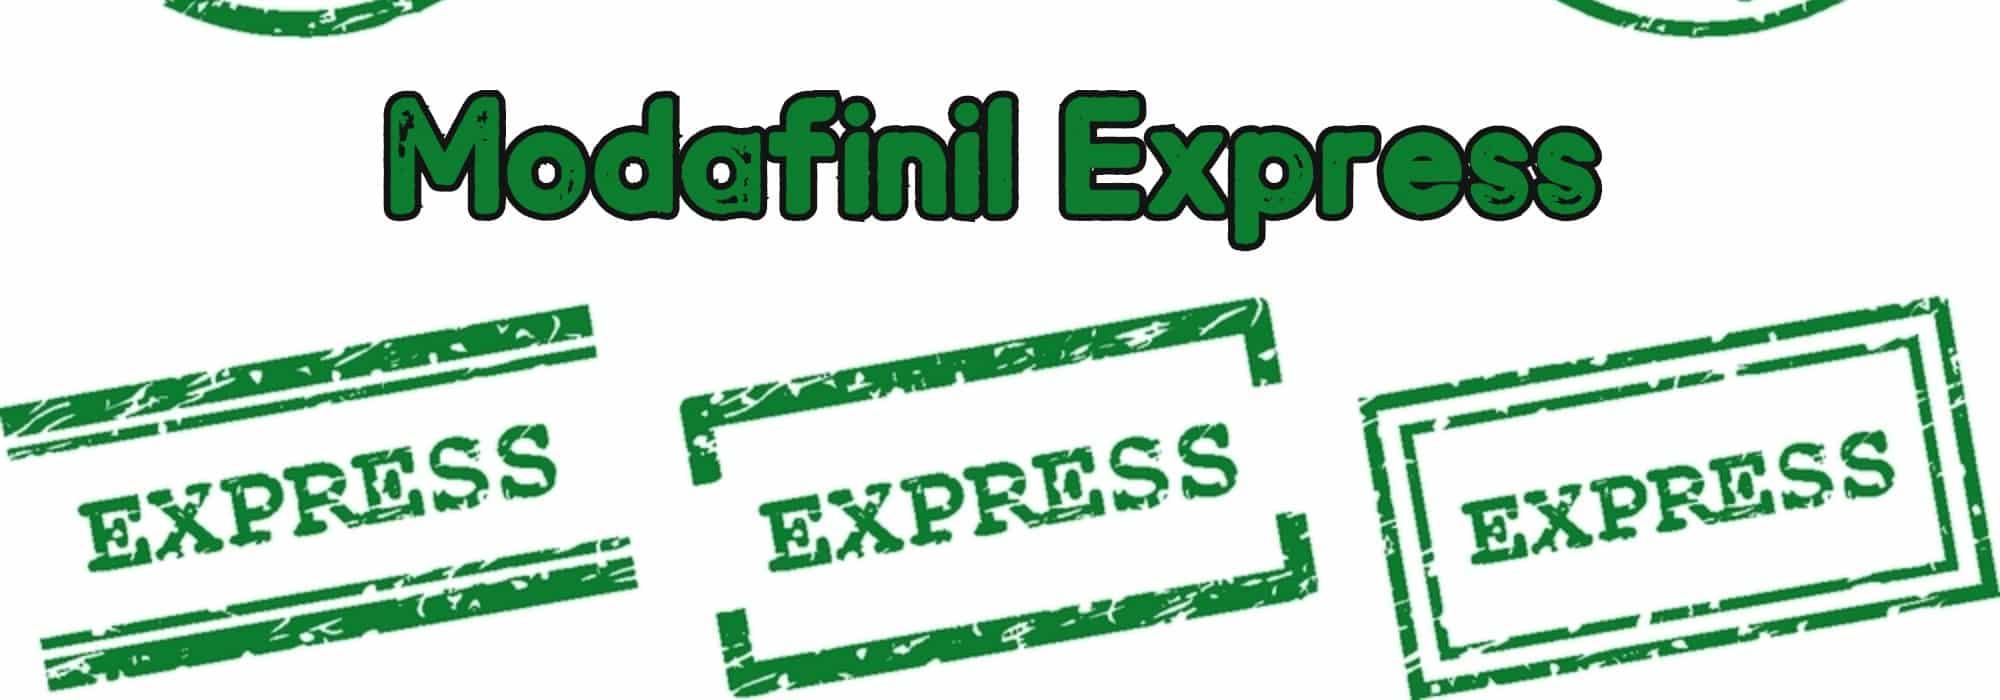 modafinil express, afinilexpress